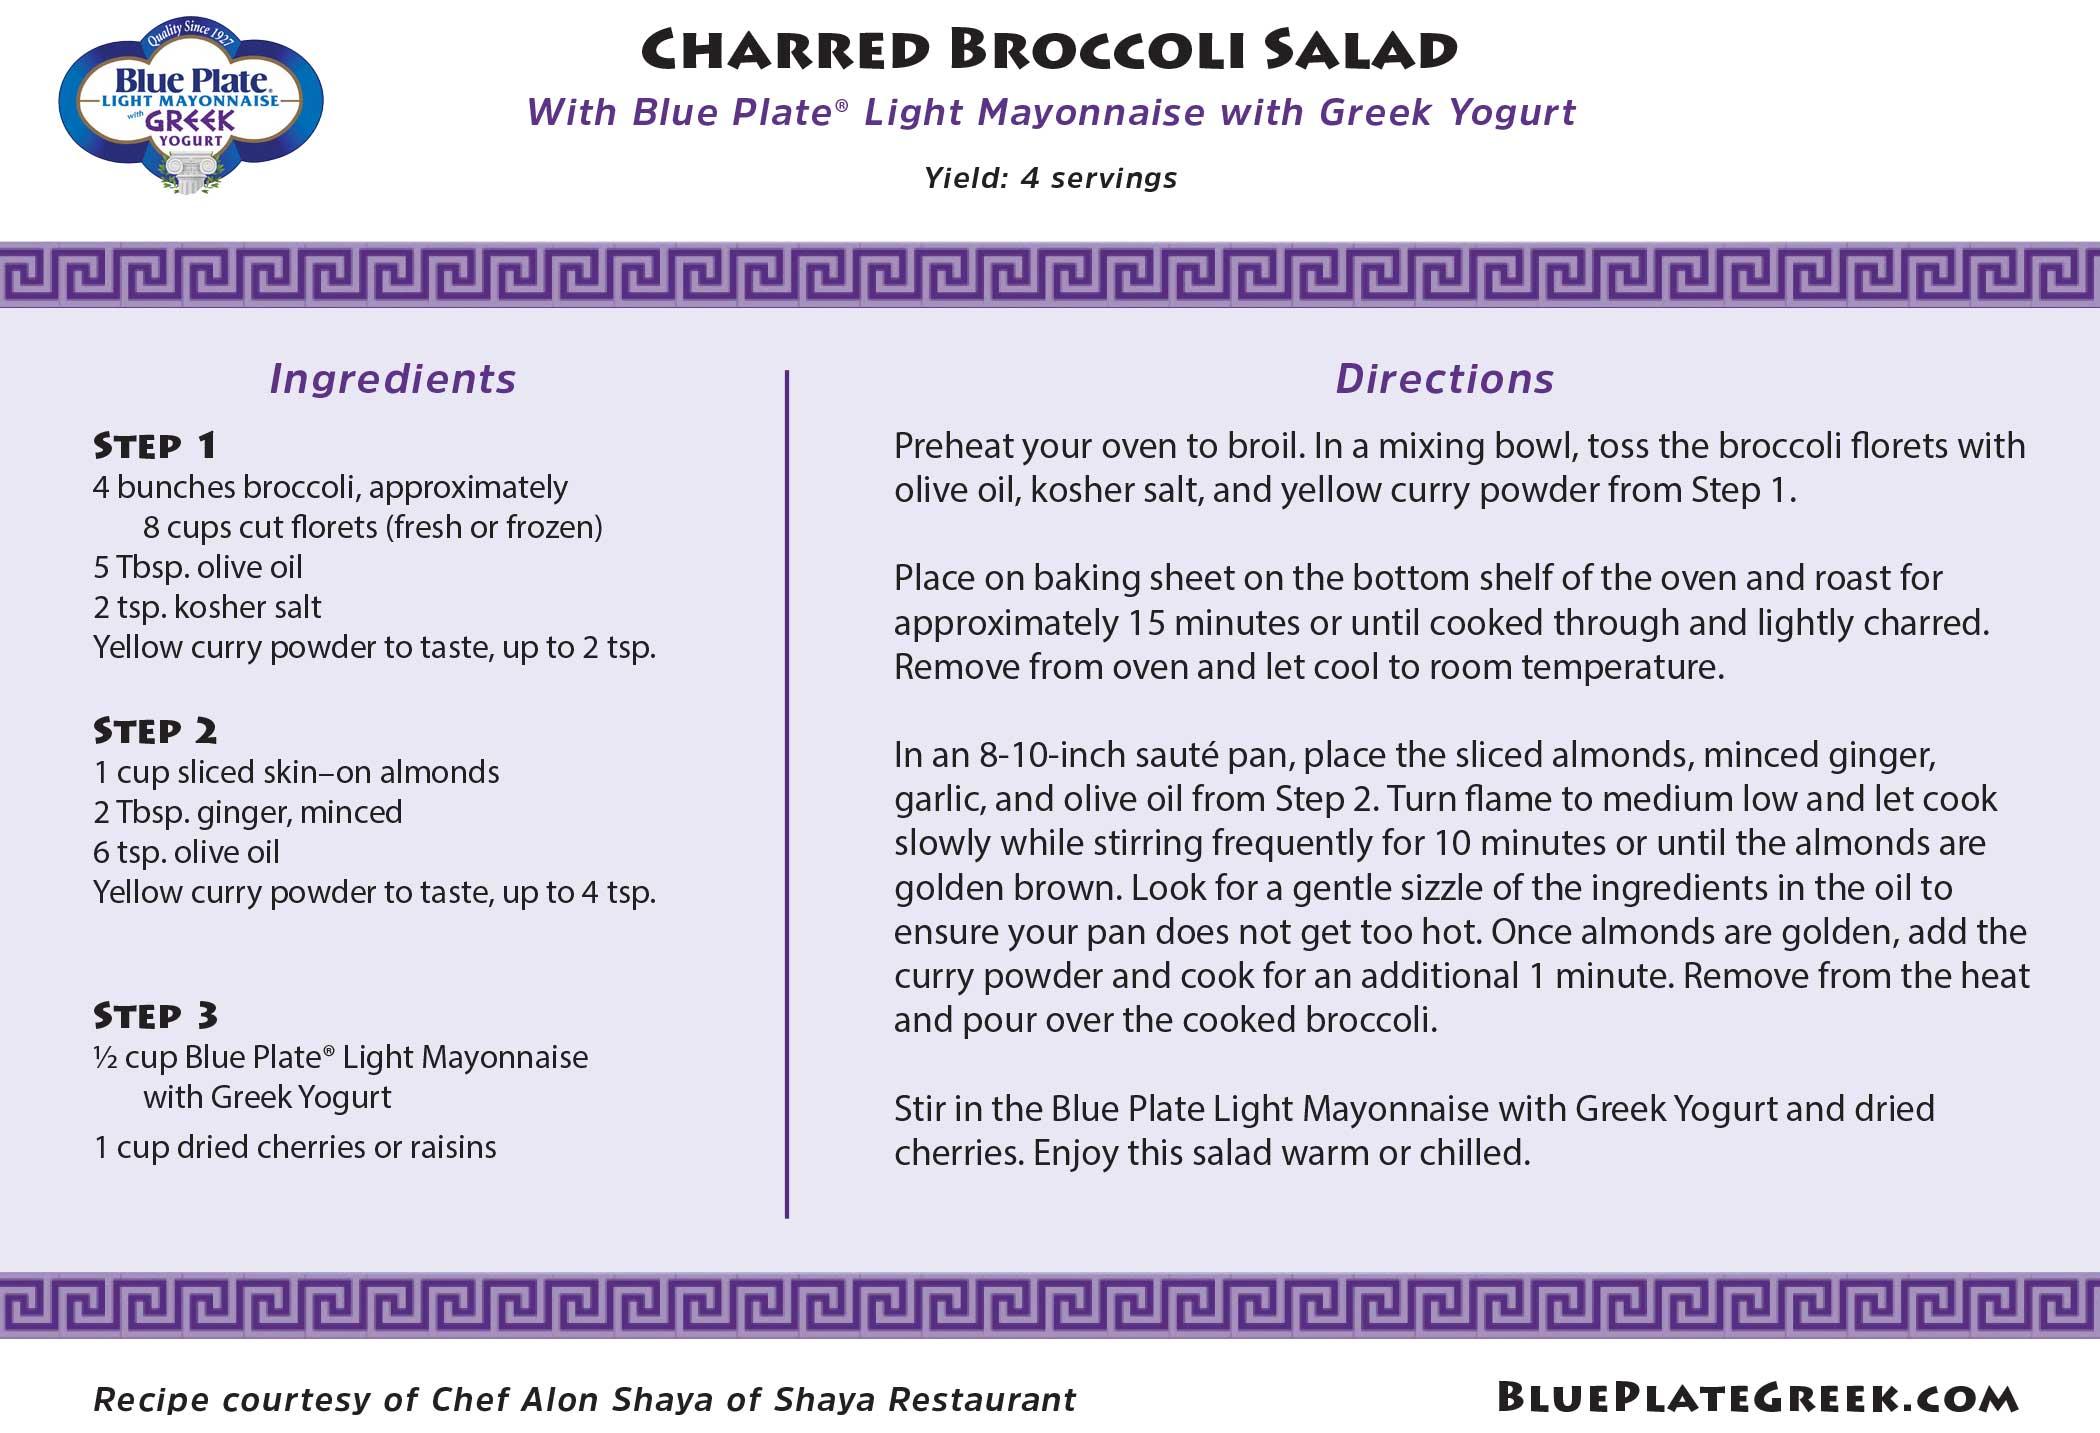 Three recipes from James Beard Award winner Chef Alon Shaya, featuring the new Blue Plate Light Mayonnaise with Greek Yogurt